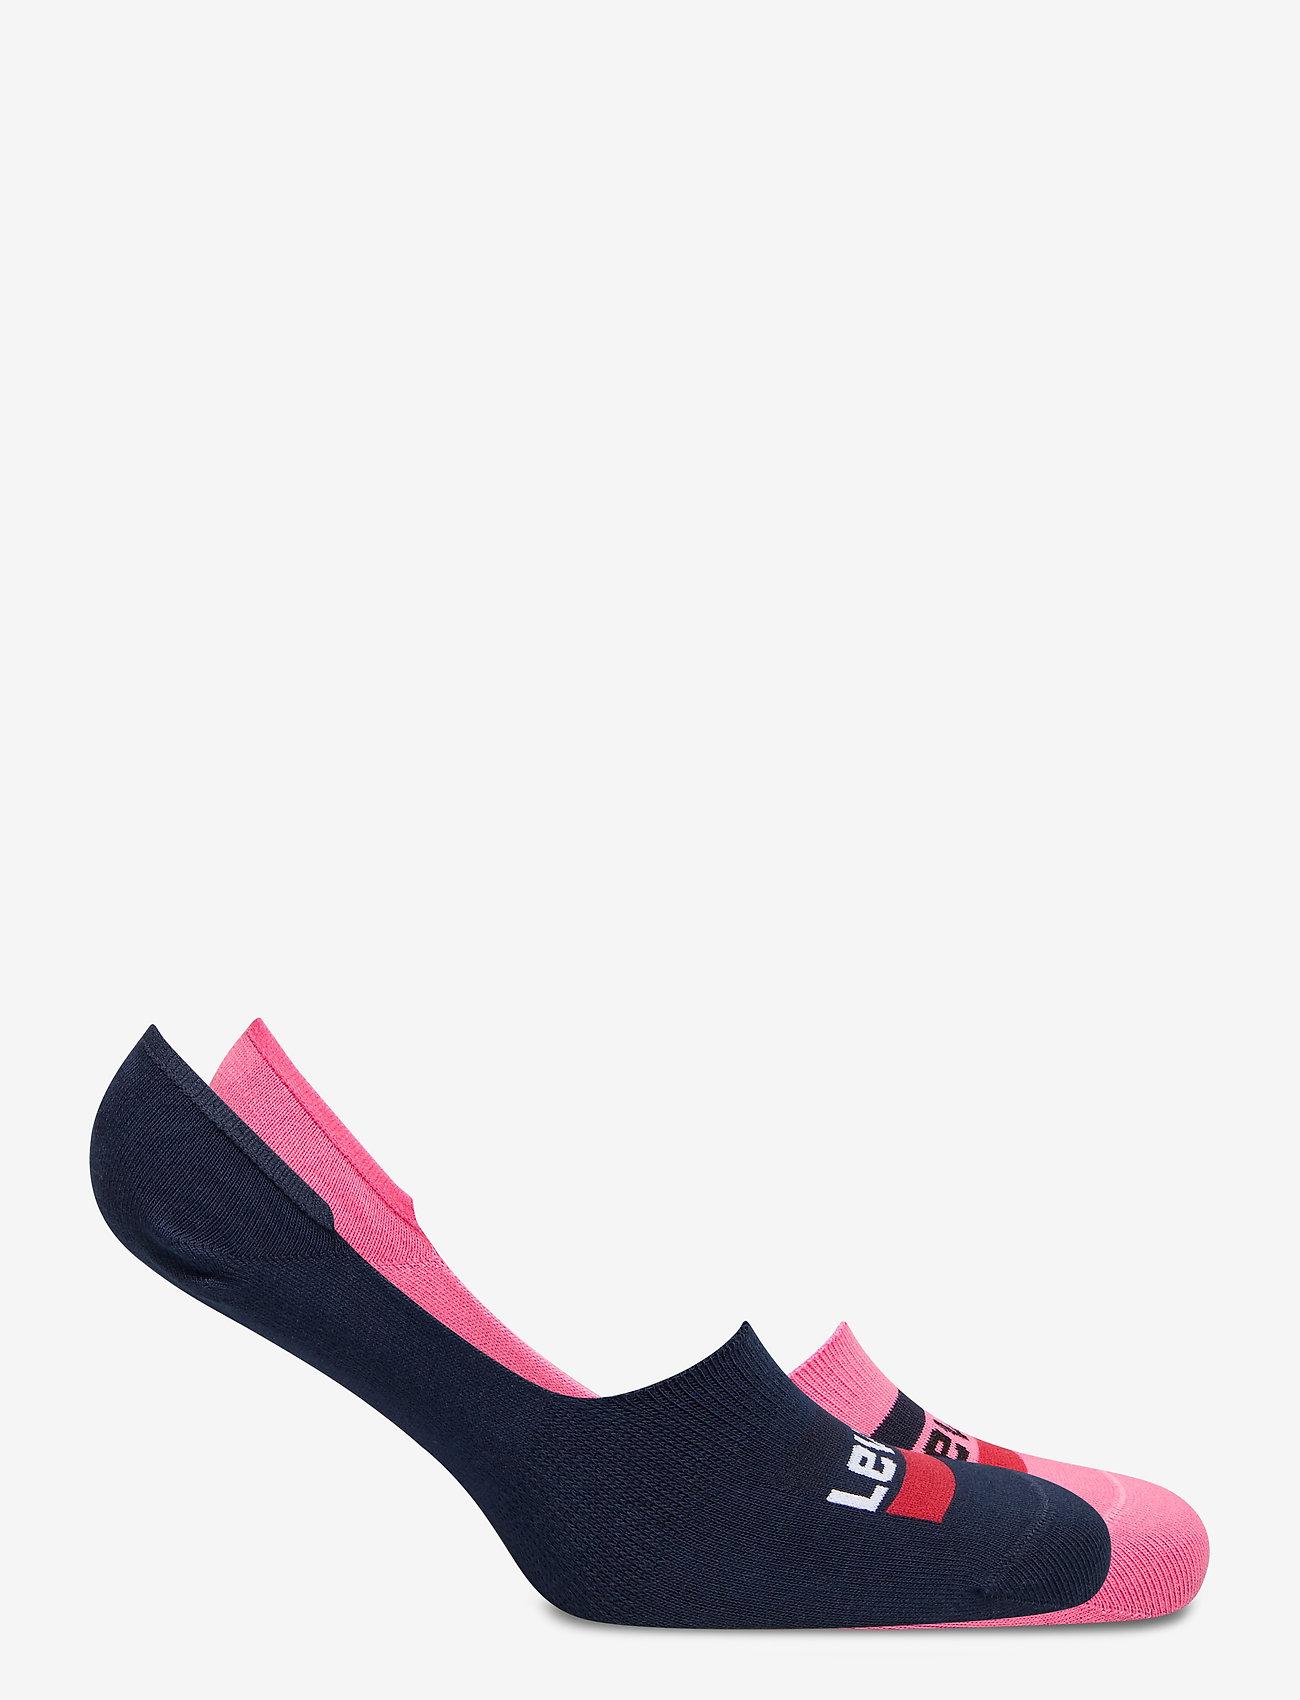 Levi´s - LEVIS LOW RISE SPORTWR LOGO 2P - footies - pink combo - 1